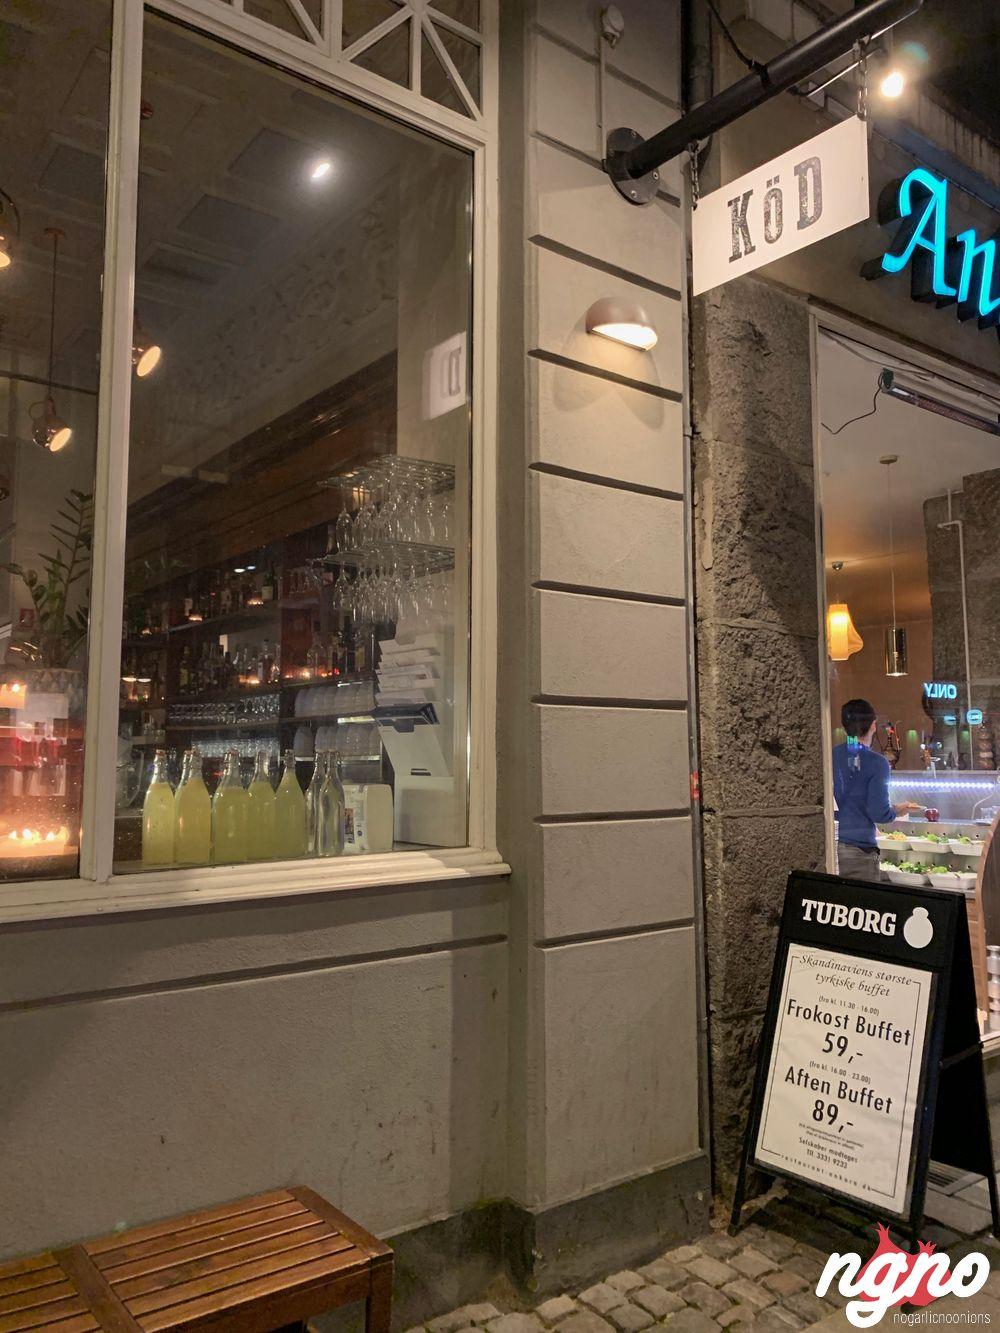 KOD Copenhagen: Dining in the Dark A Very Good Meat